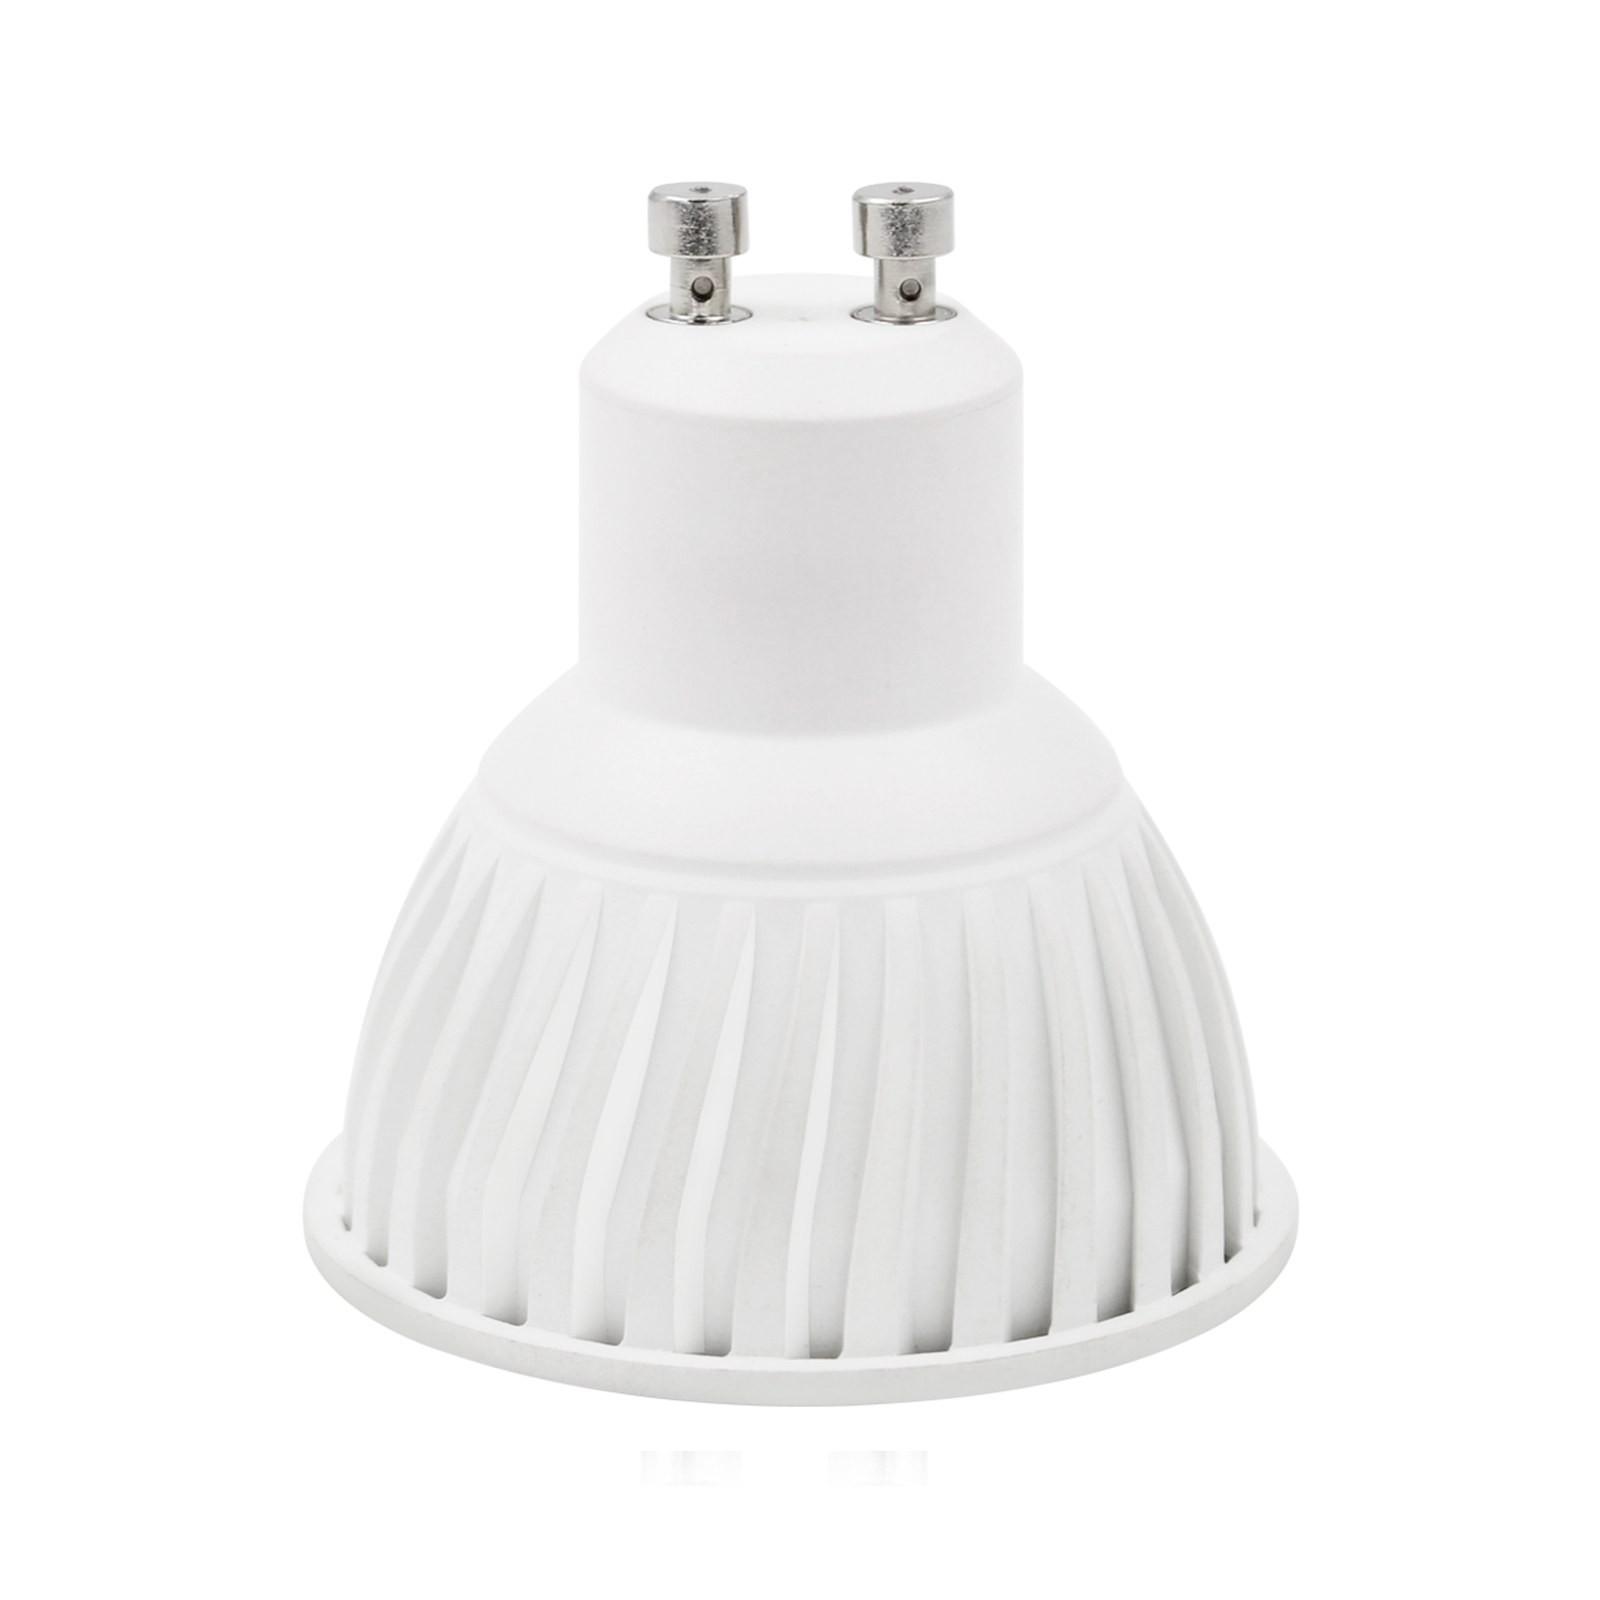 Lampada led lampadina gu10 luce bianca naturale par16 life for Luce bianca led